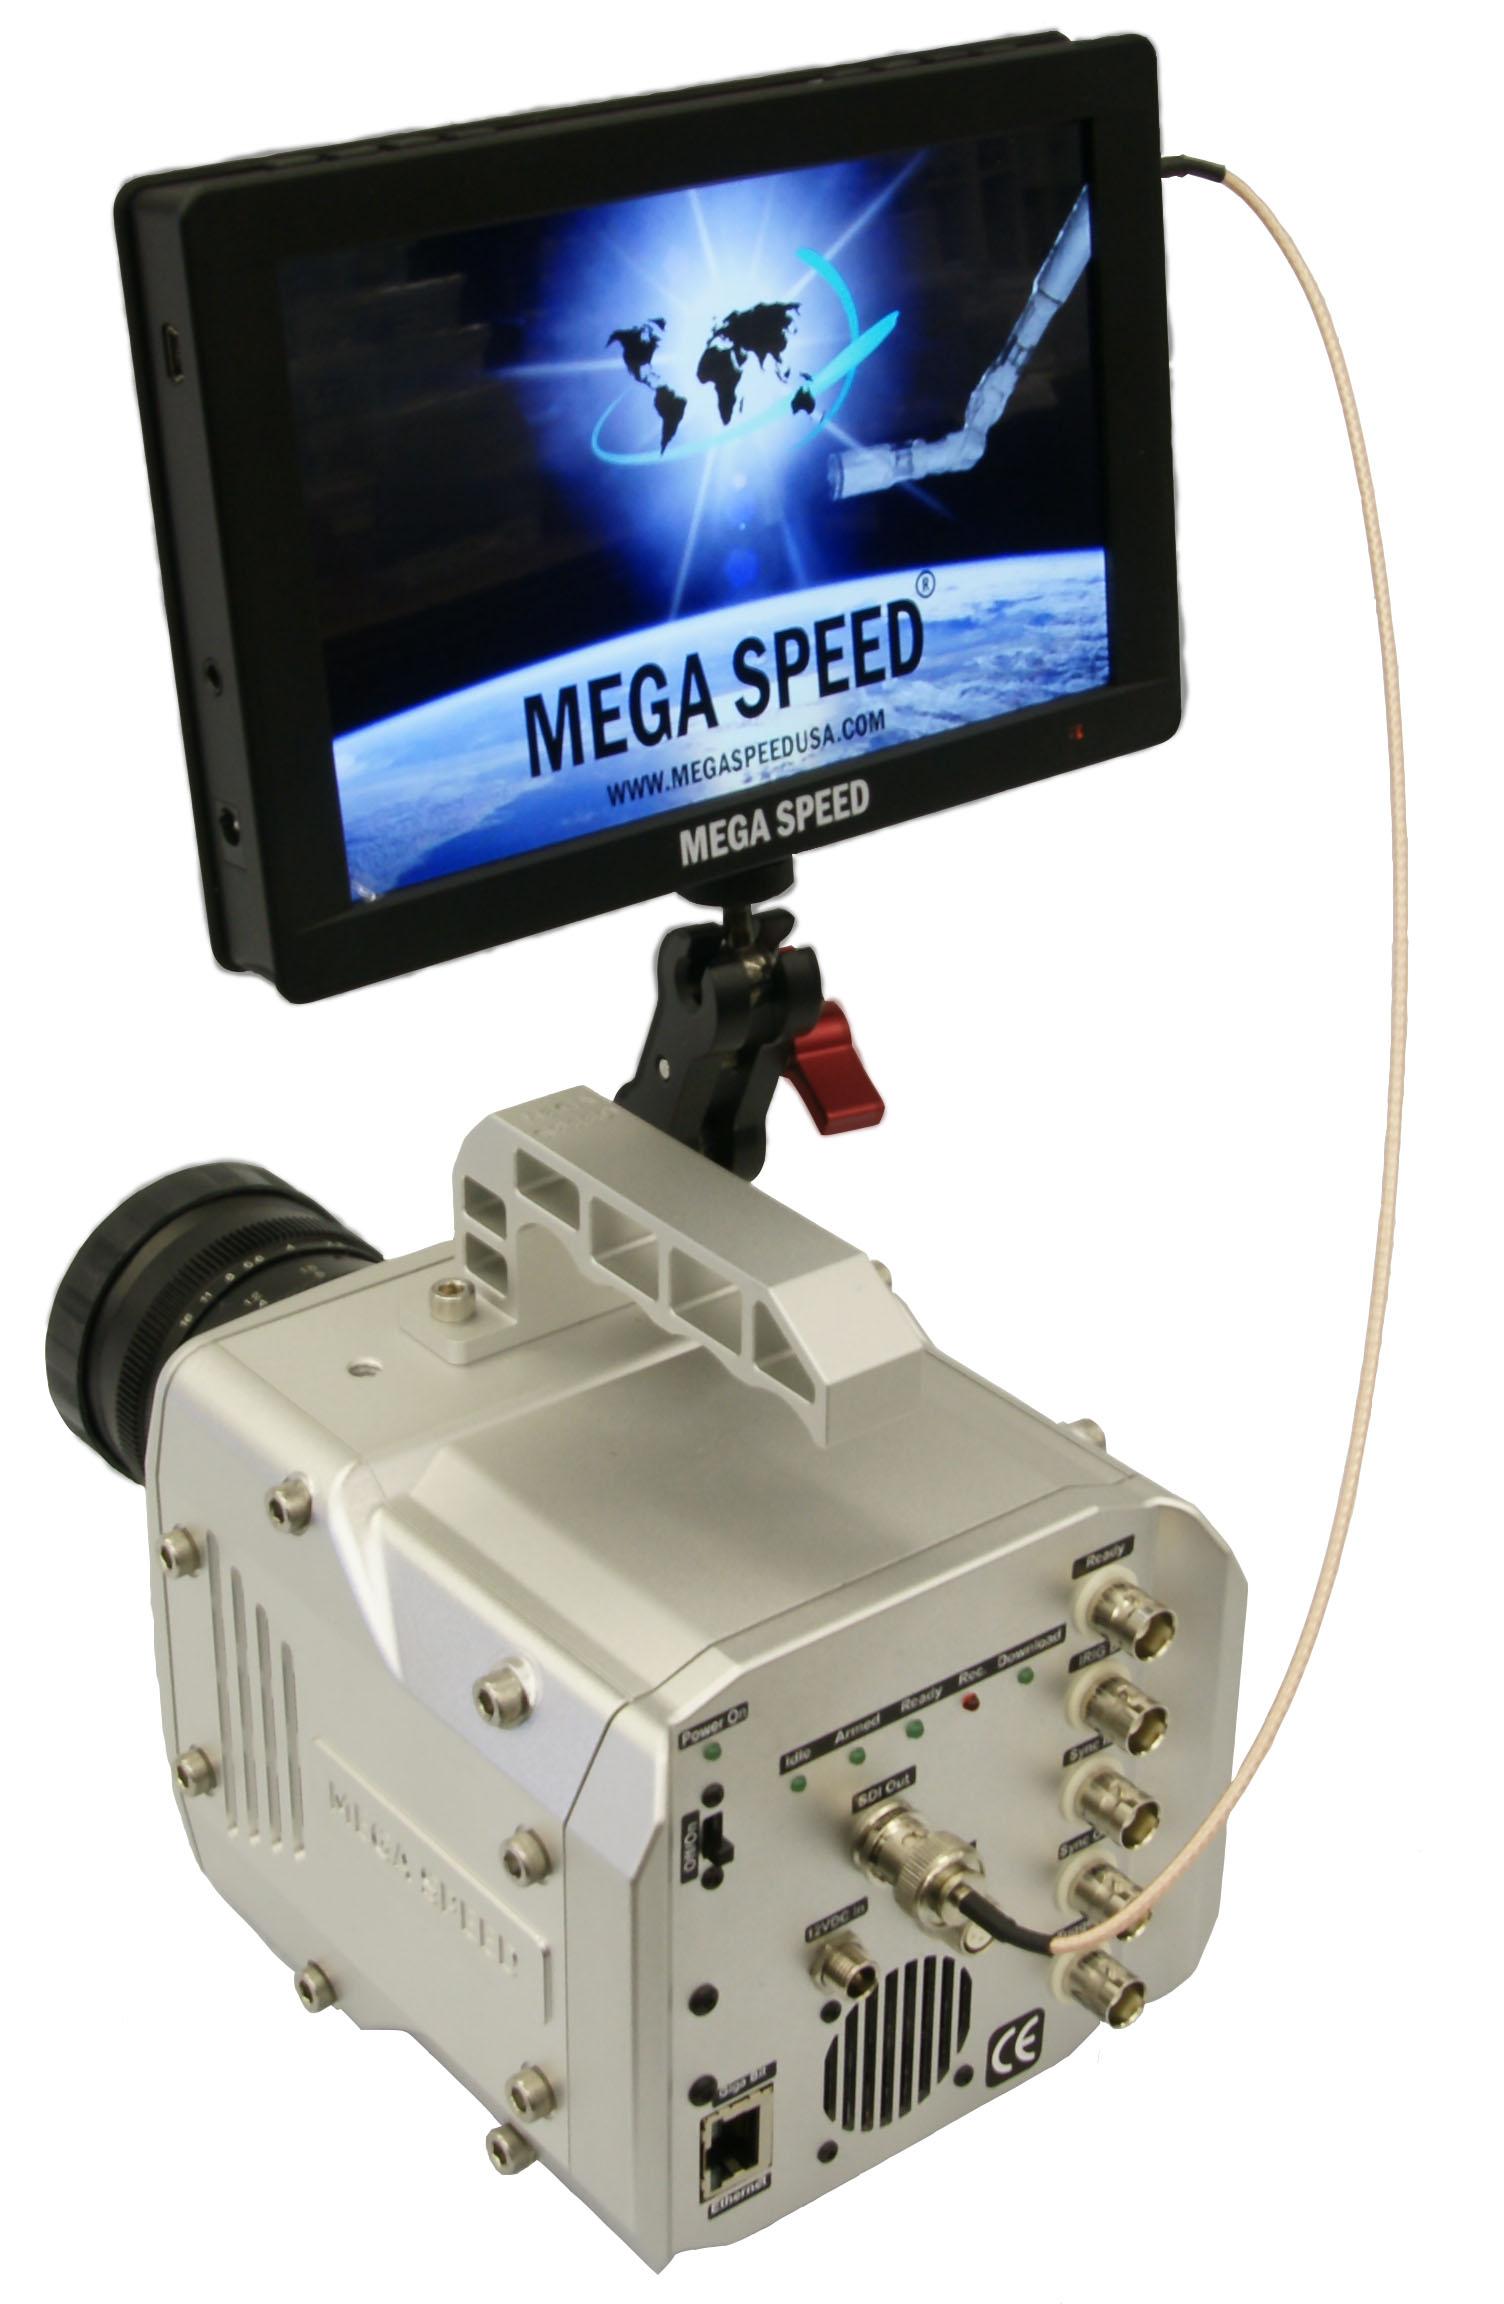 MS136K 高速相机Mega Speed